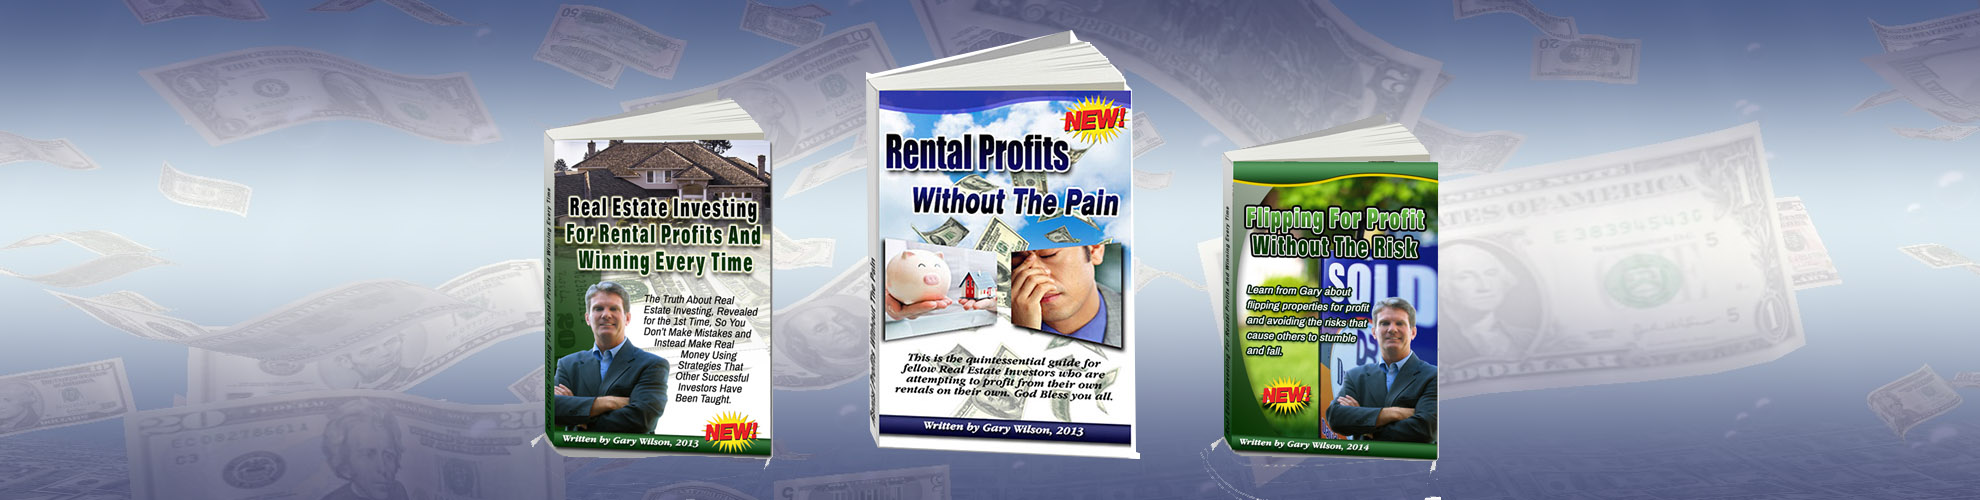 The lighter side of rental properties